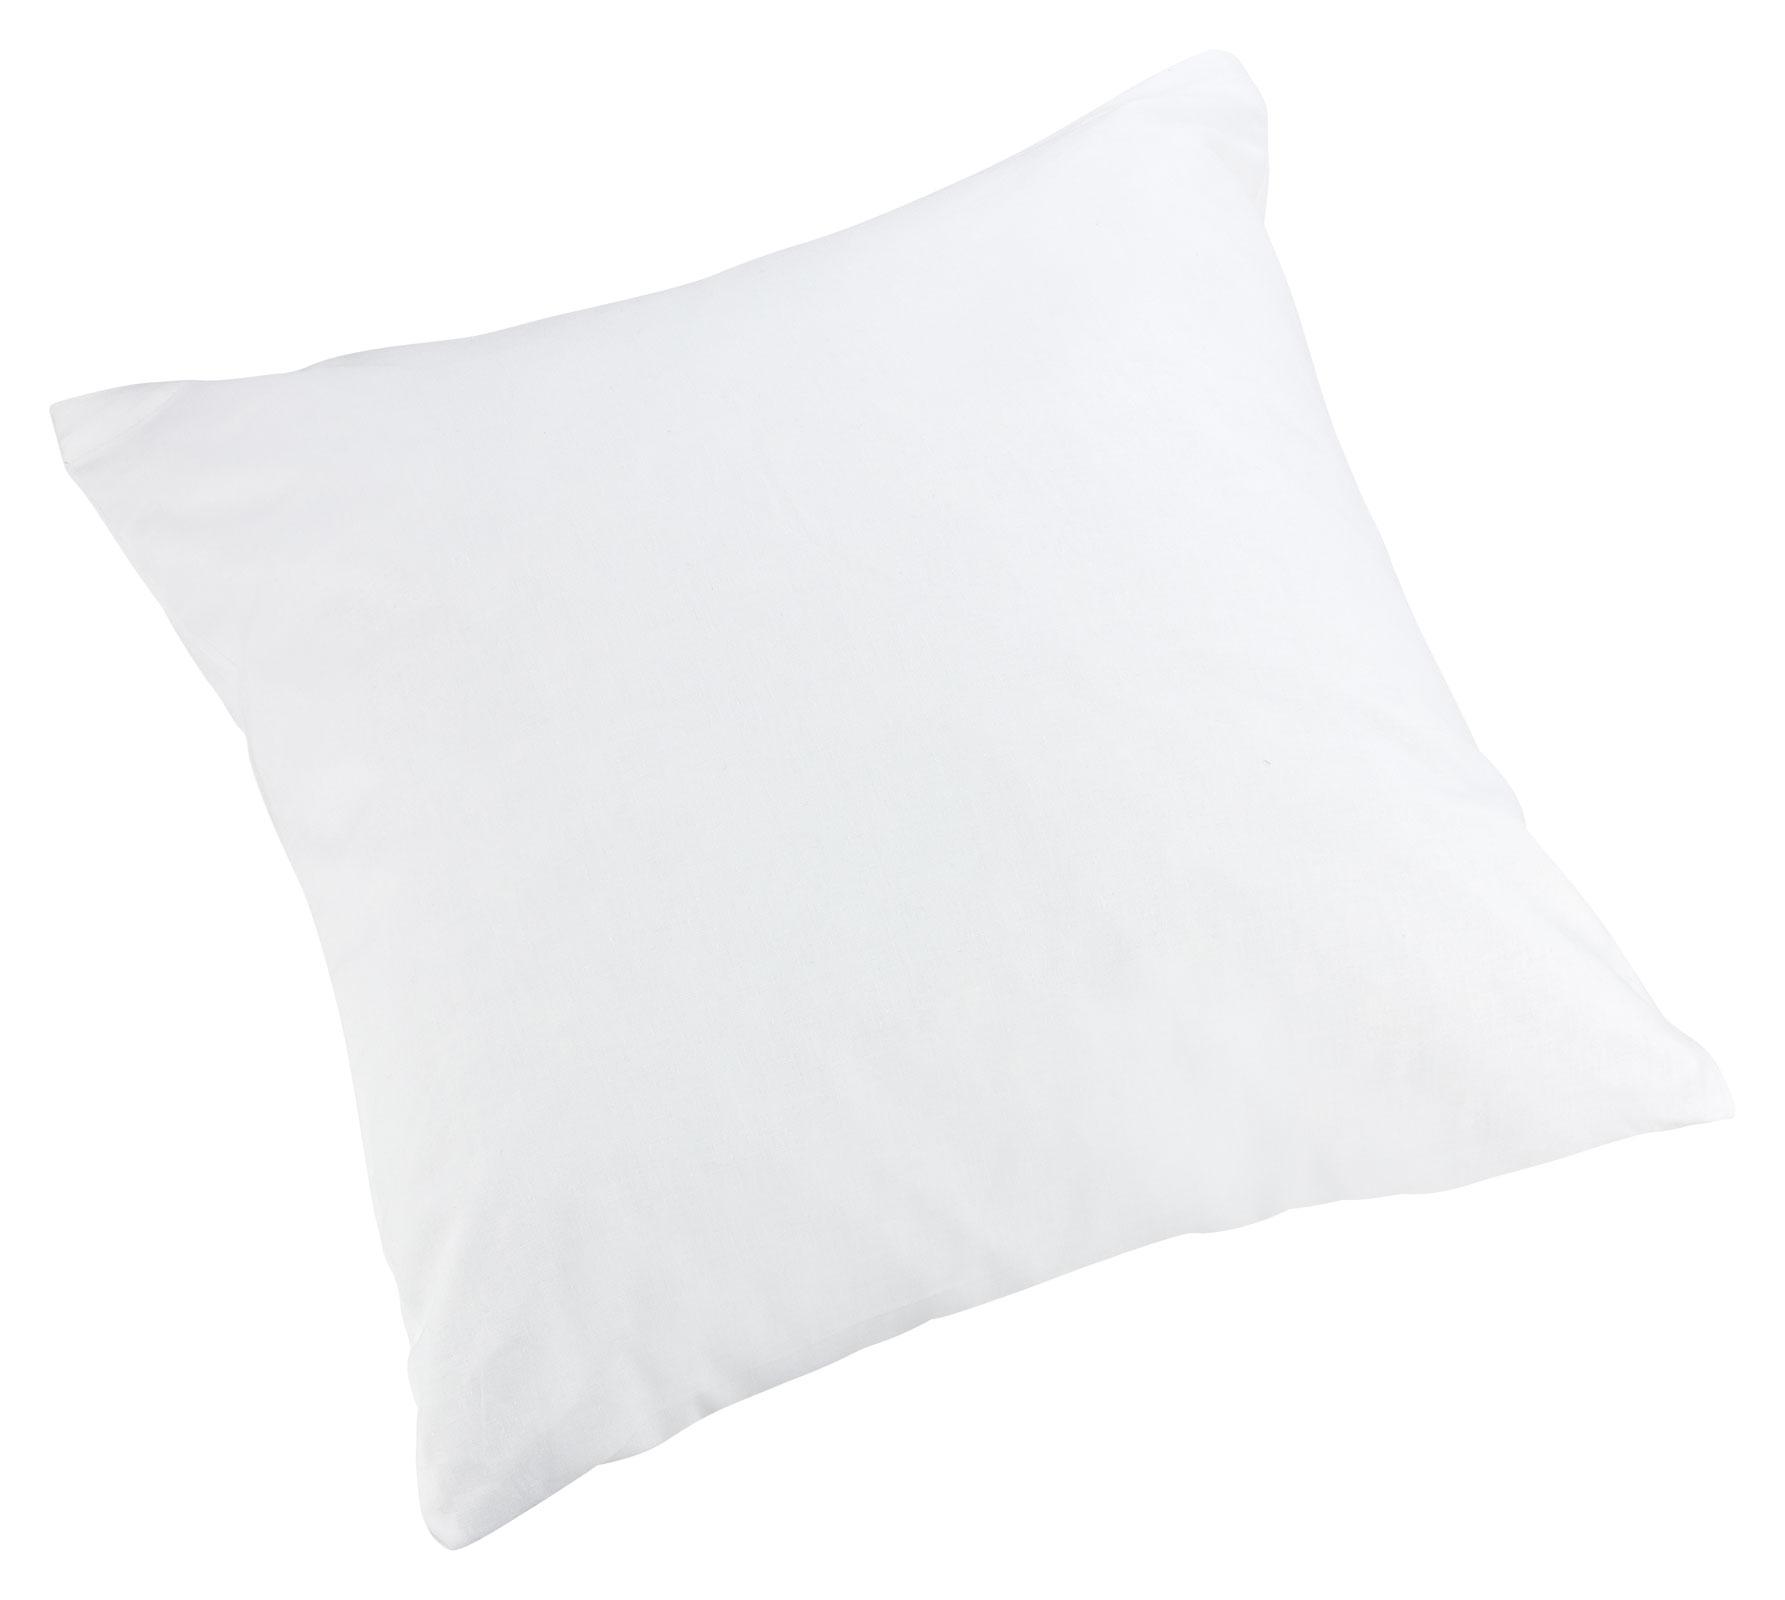 kissenbezug kissenh lle moon renforce 100 baumwolle rei verschluss kissen h lle ebay. Black Bedroom Furniture Sets. Home Design Ideas